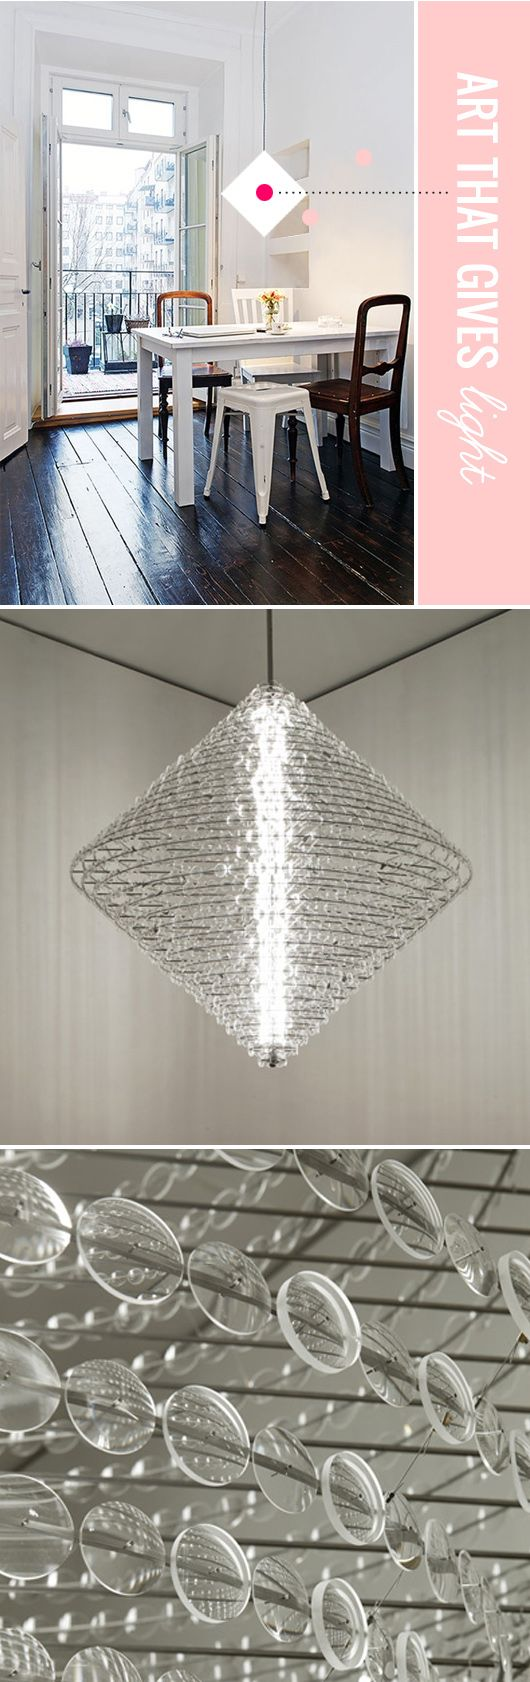 274 best light fittings tutorials and inspiration images on chandelier by lighting designerartist stuart haygarth titled magoo arubaitofo Choice Image